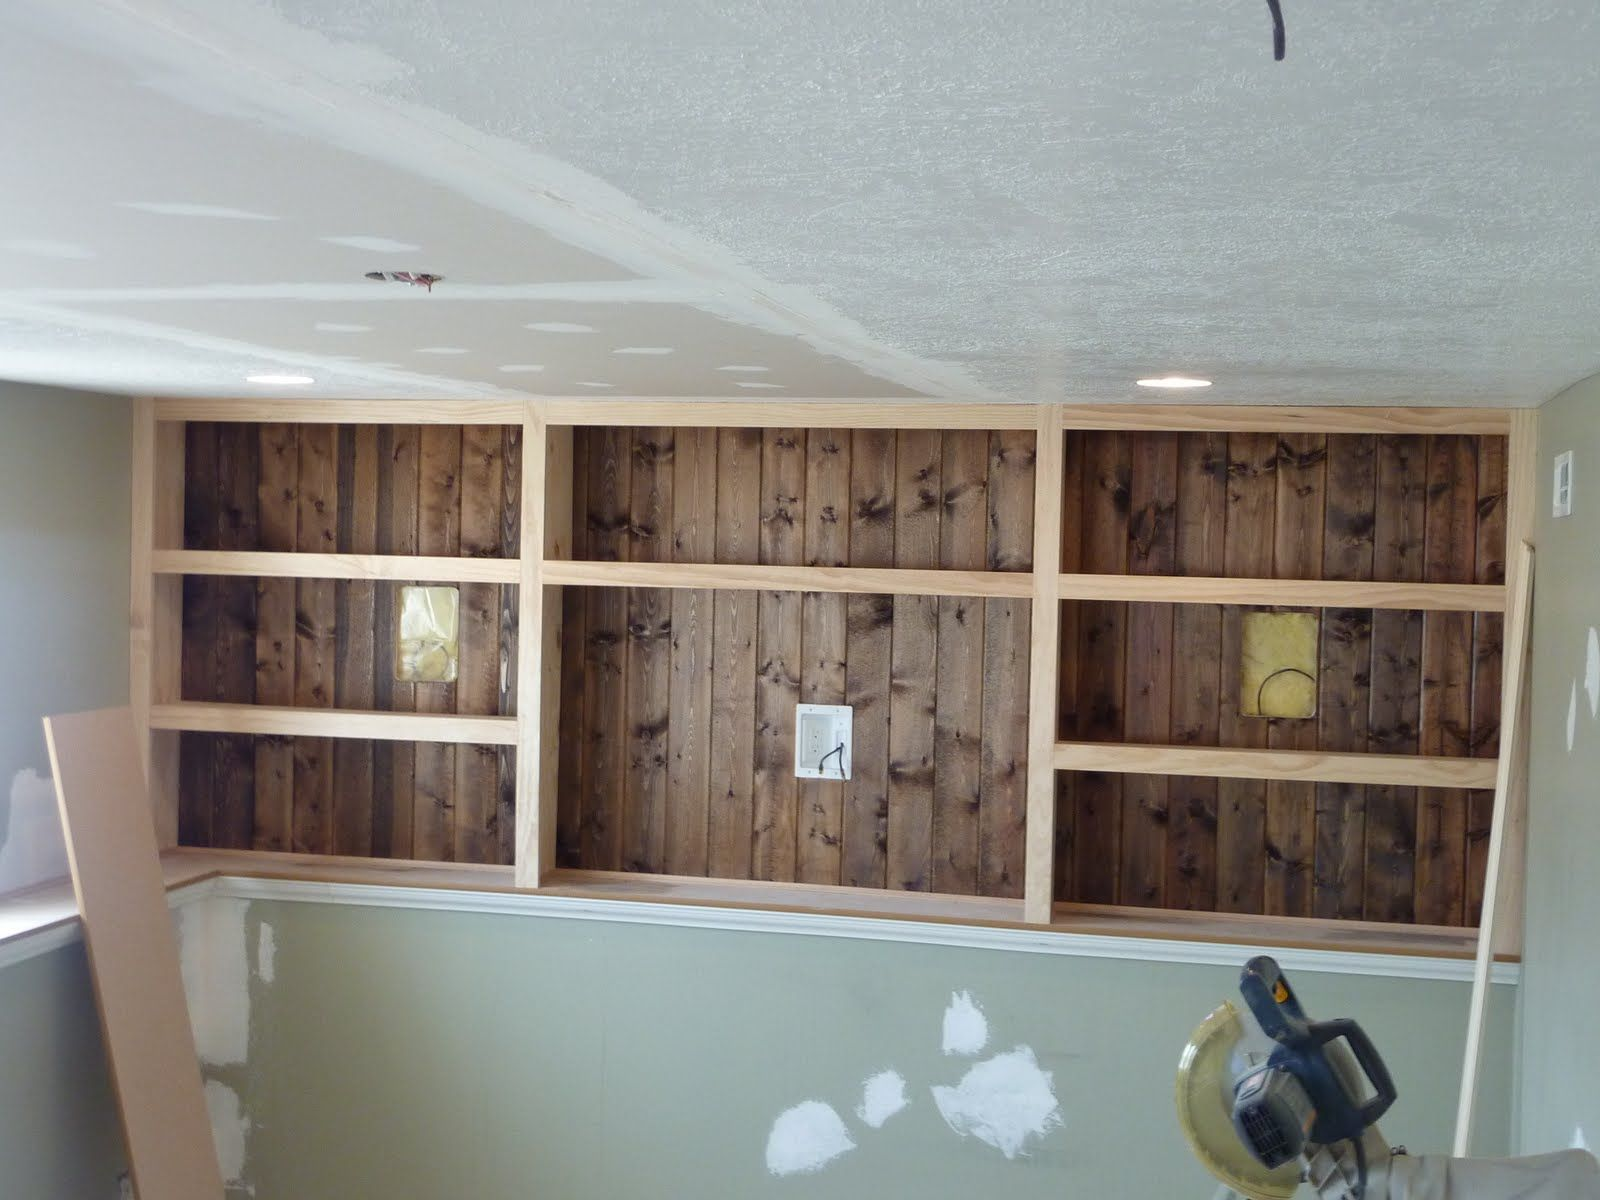 Sassy Sanctuary Progress Report Trim And More Trim Bookshelves Built In Basement Living Rooms Basement Master Bedroom